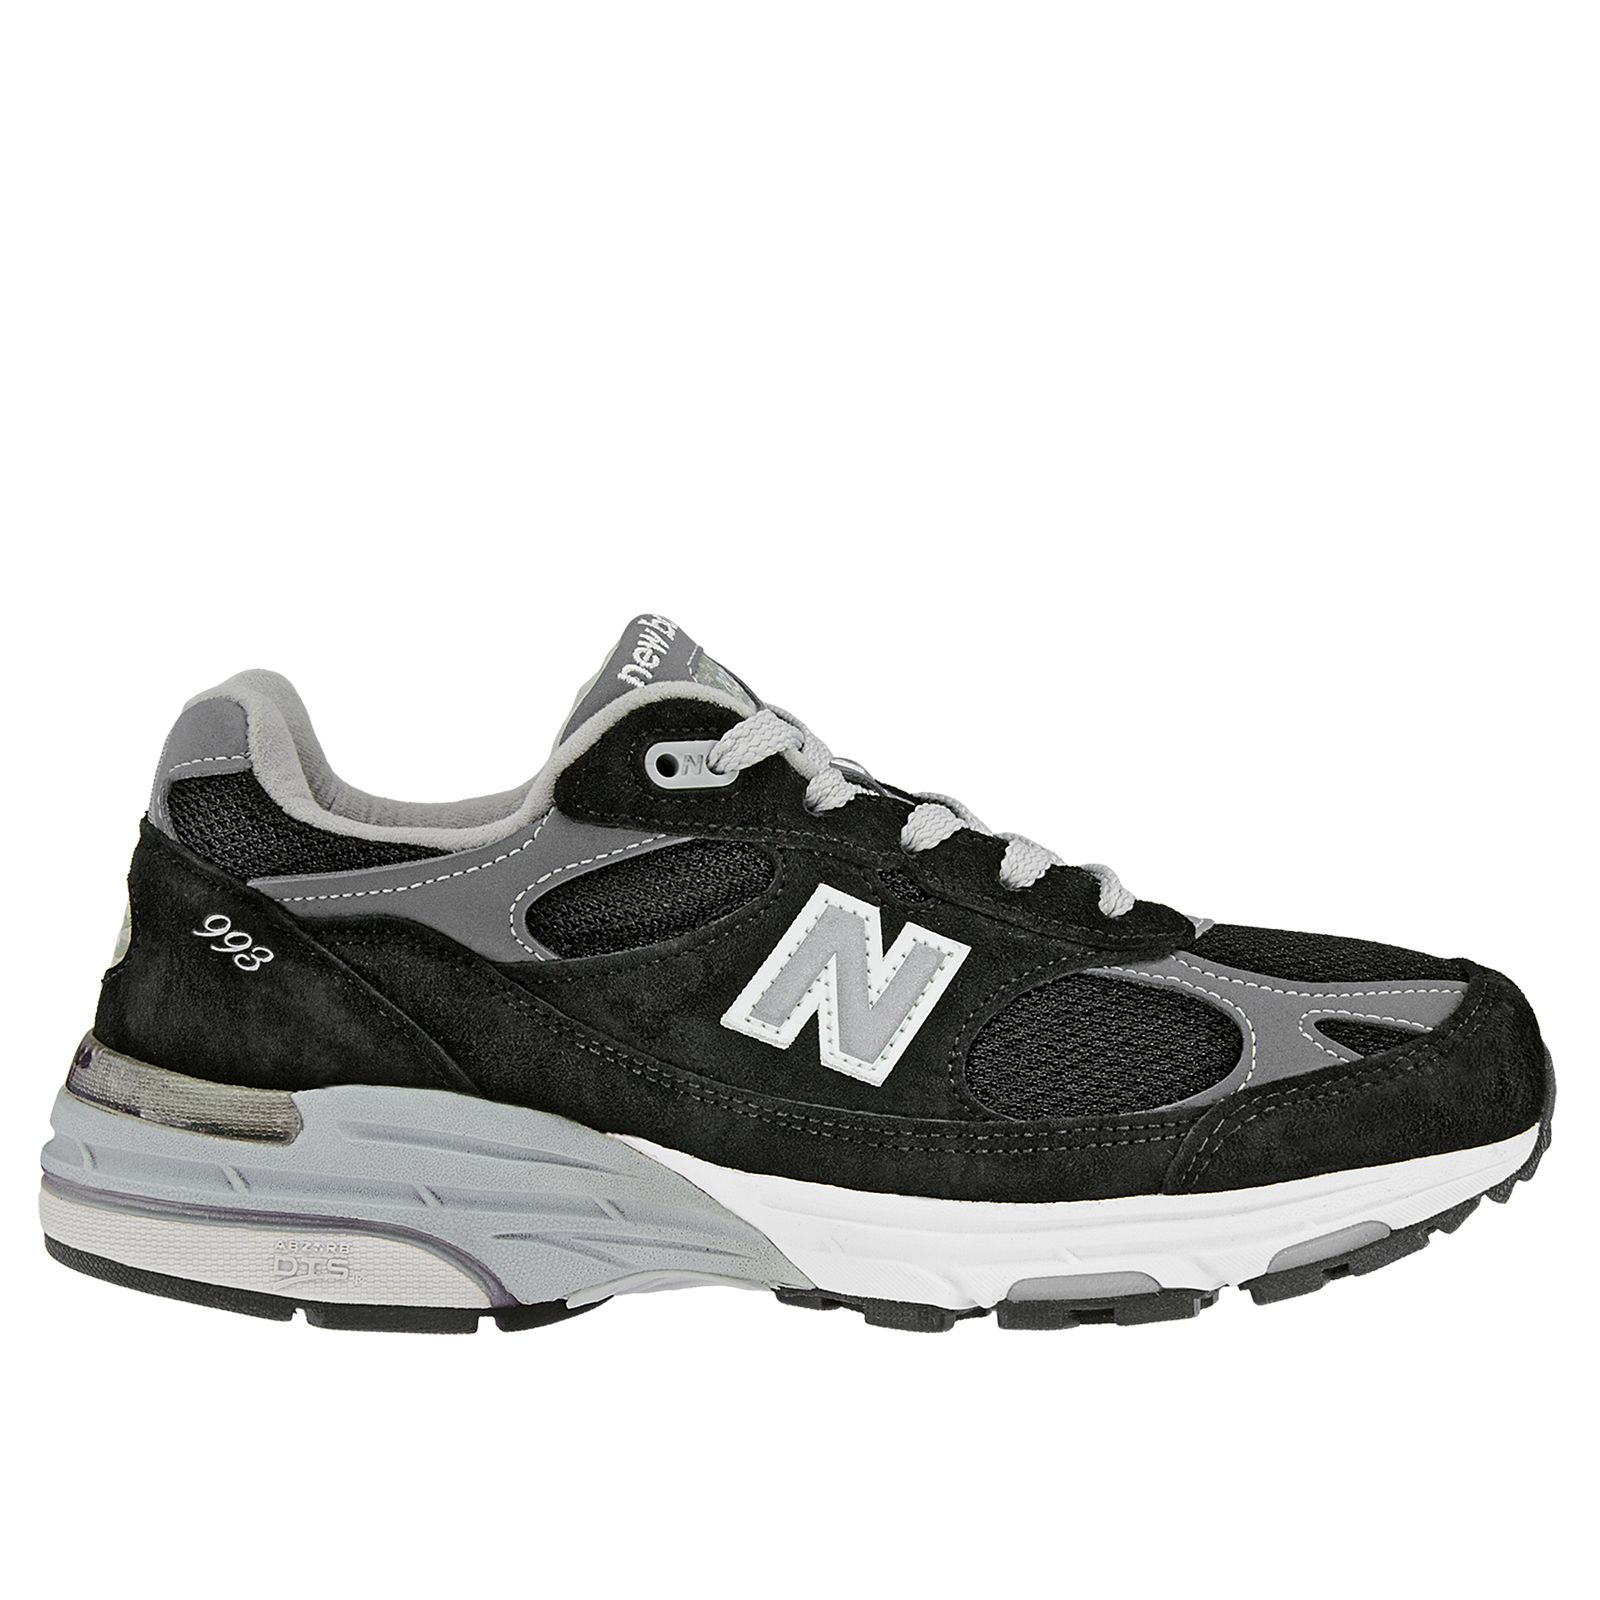 New Balance Womens Classics 993 Stability Running Shoes Black